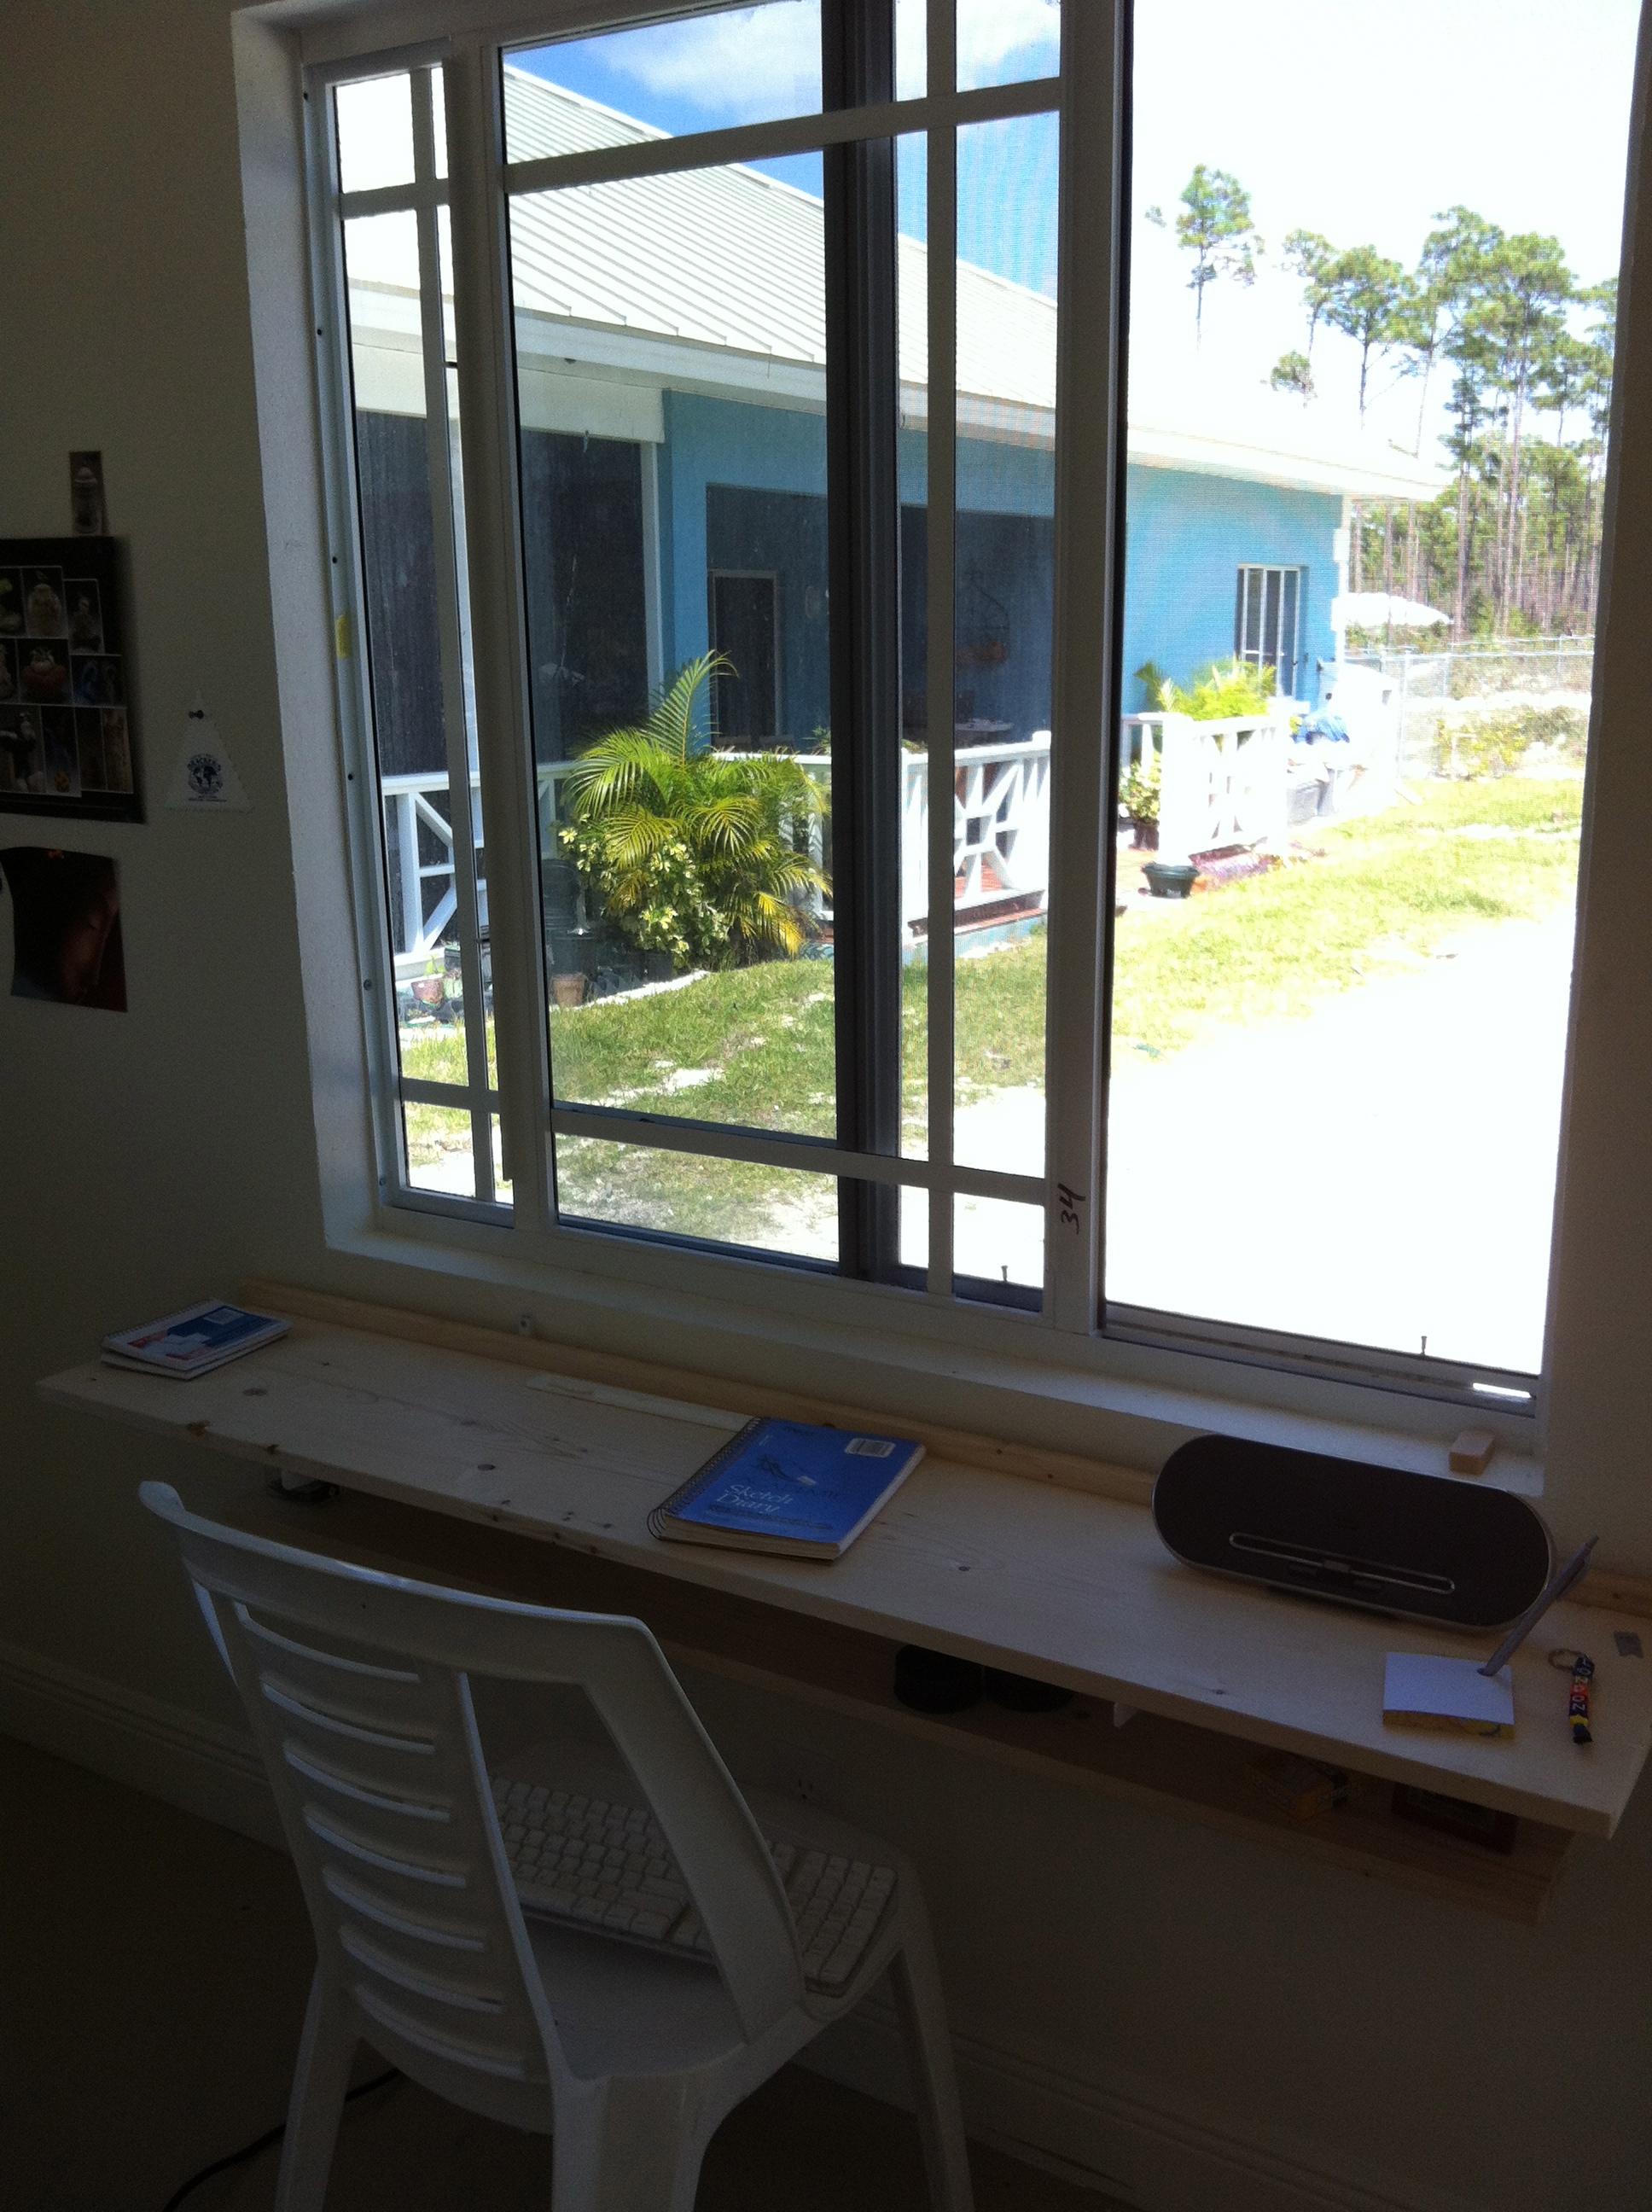 Tiny desk.  Big ideas.